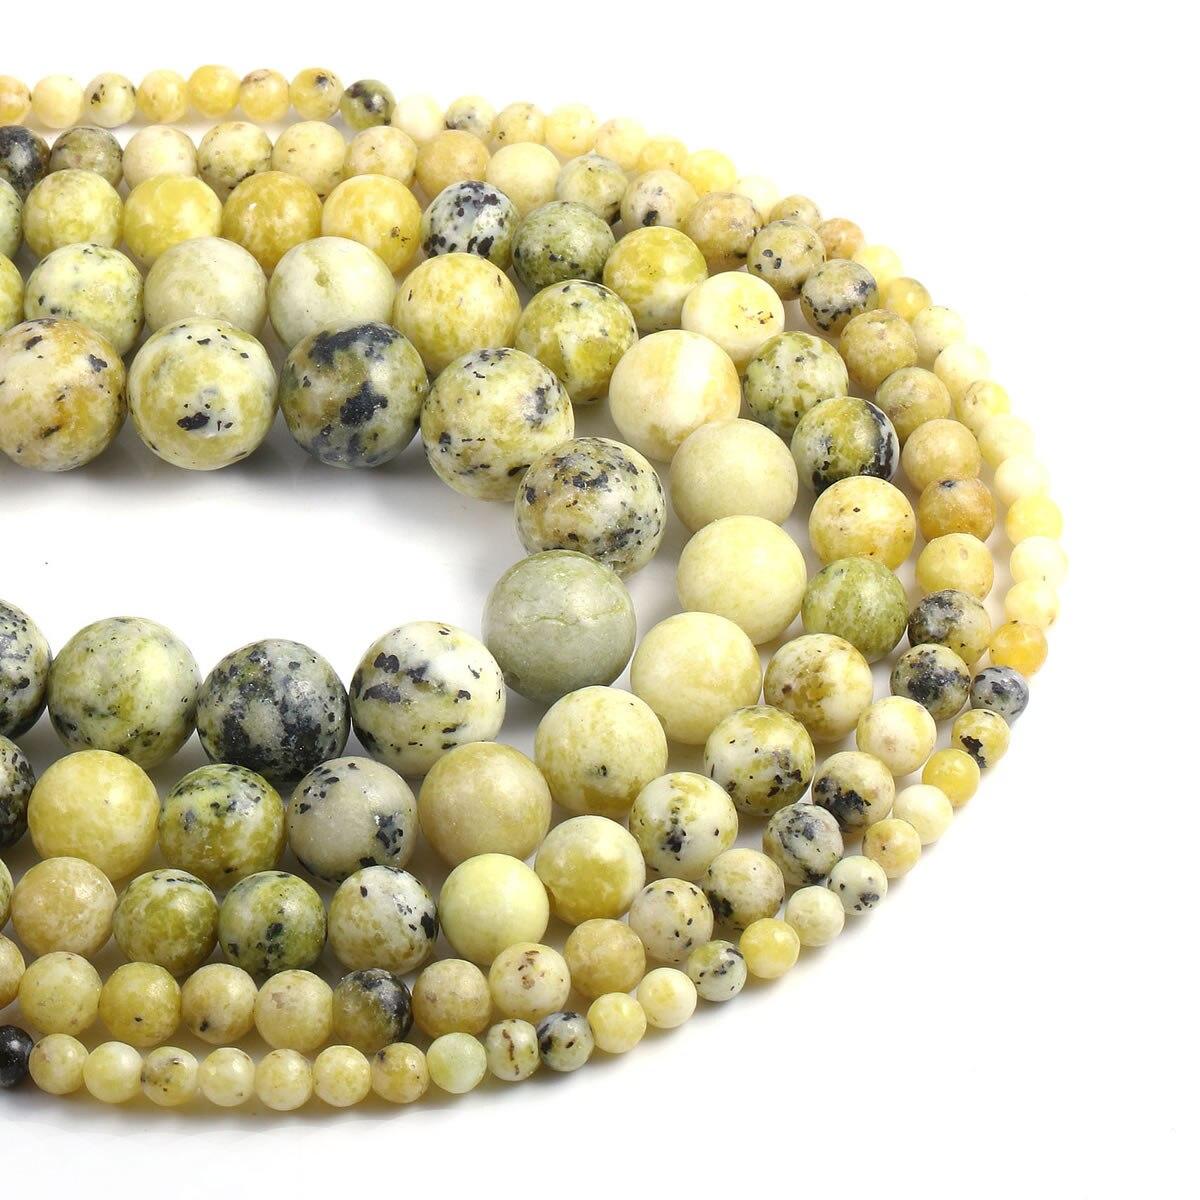 Moda natural pedra amarelo turquesa contas redondas grânulos soltos para fazer jóias diy colar tornozeleira pulseira acessórios